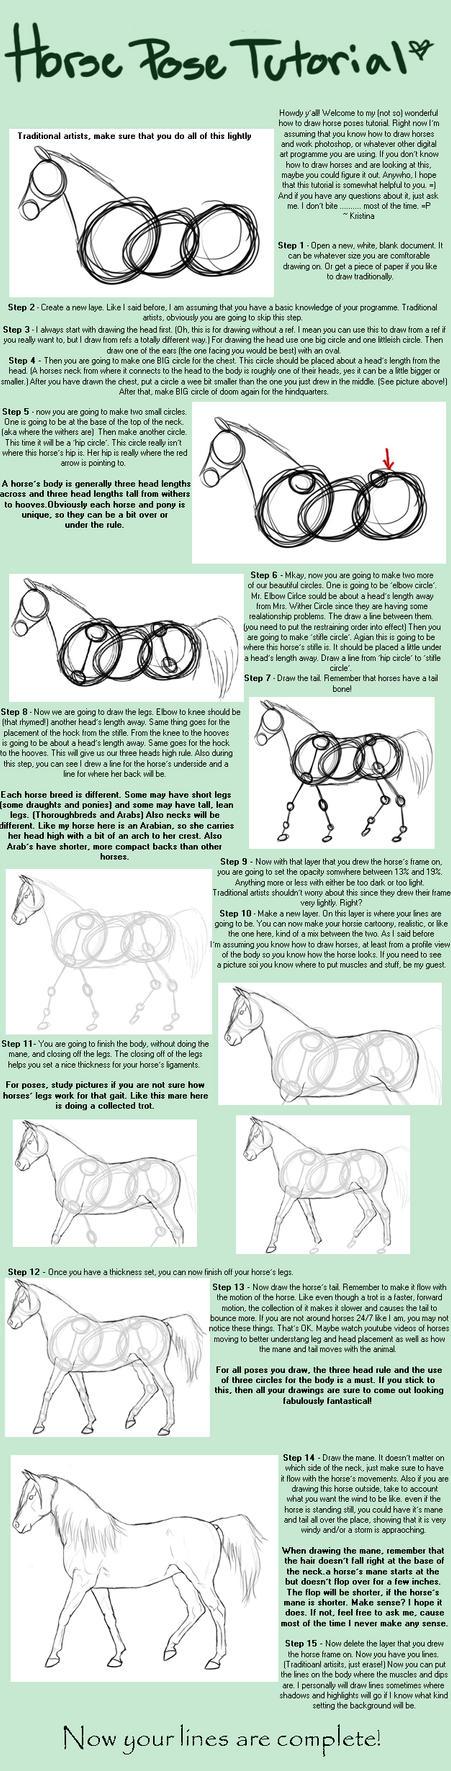 Horse Pose Tutorial by Abiadura